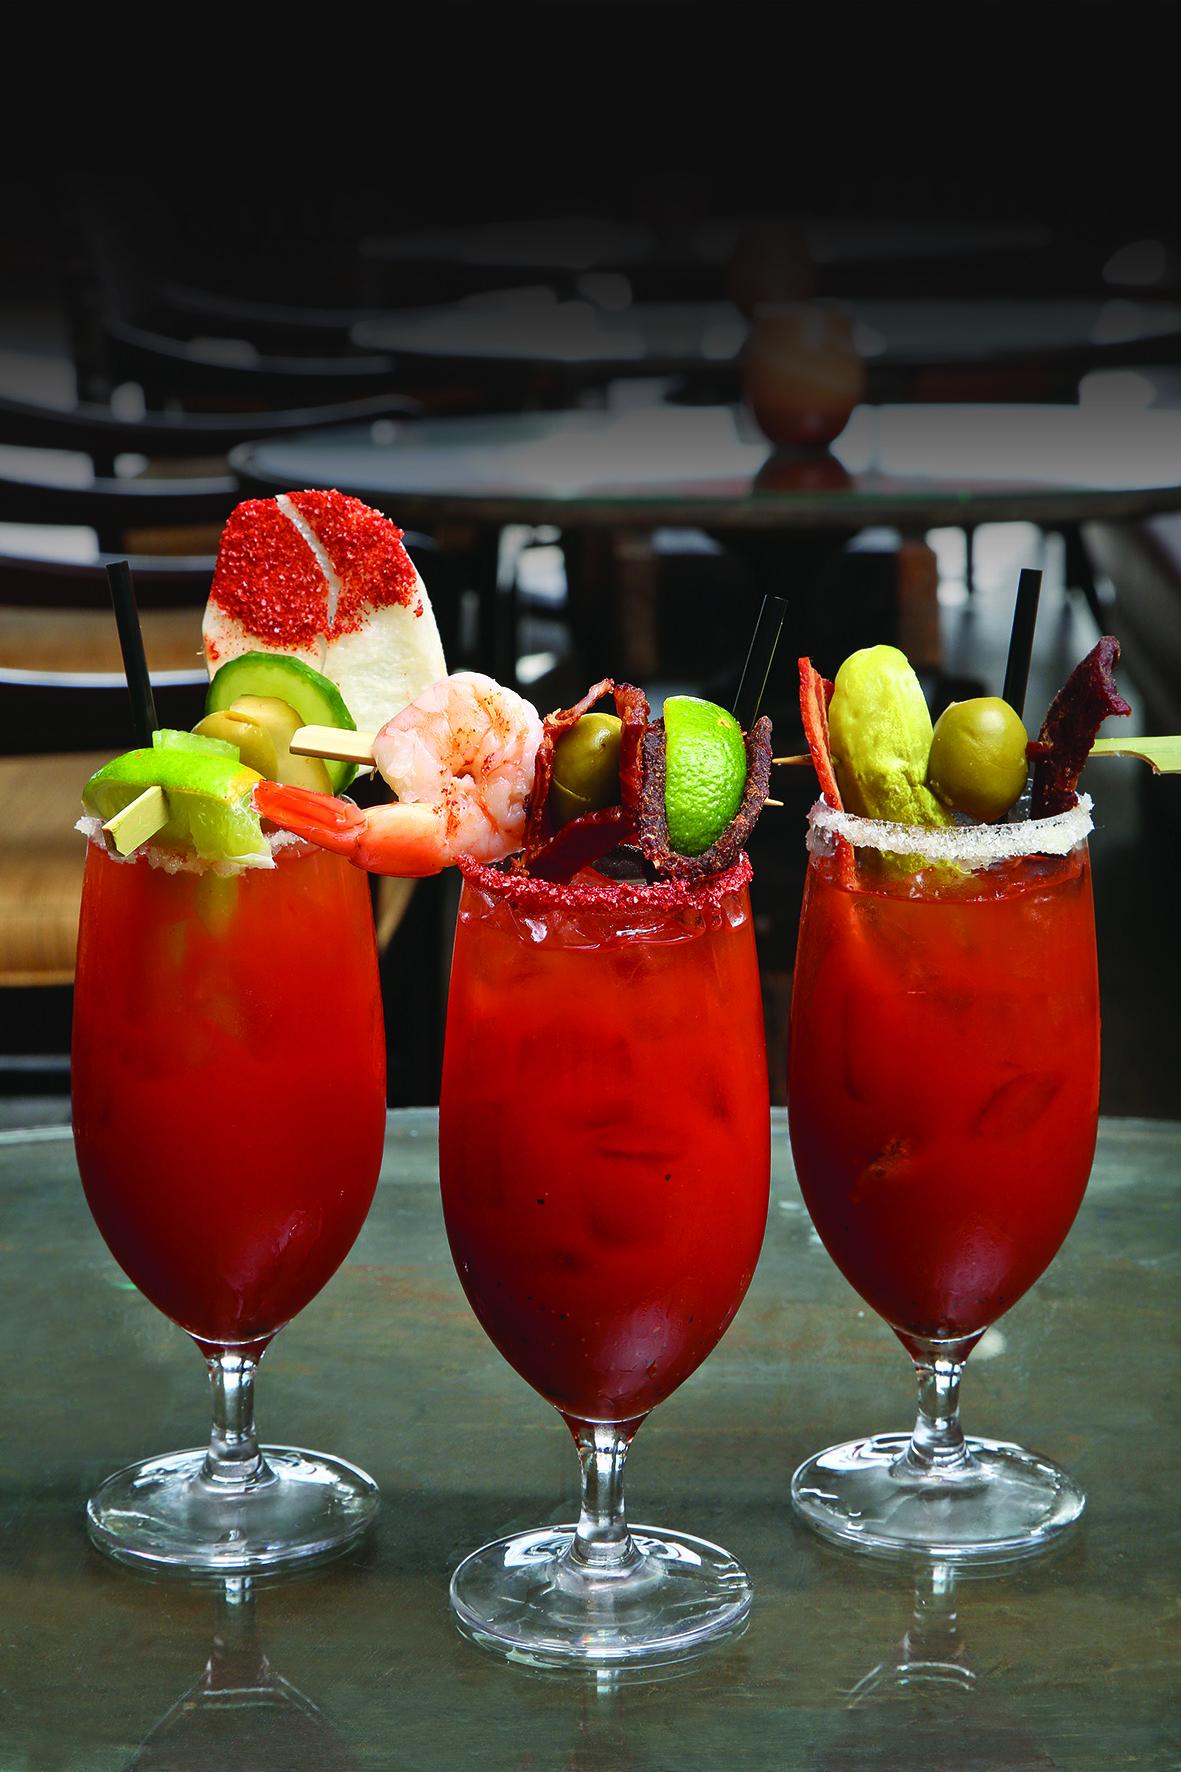 NBM_33_Brunch_AO Kitchen_Bloody Marys_By Jody Tiongco-33-B